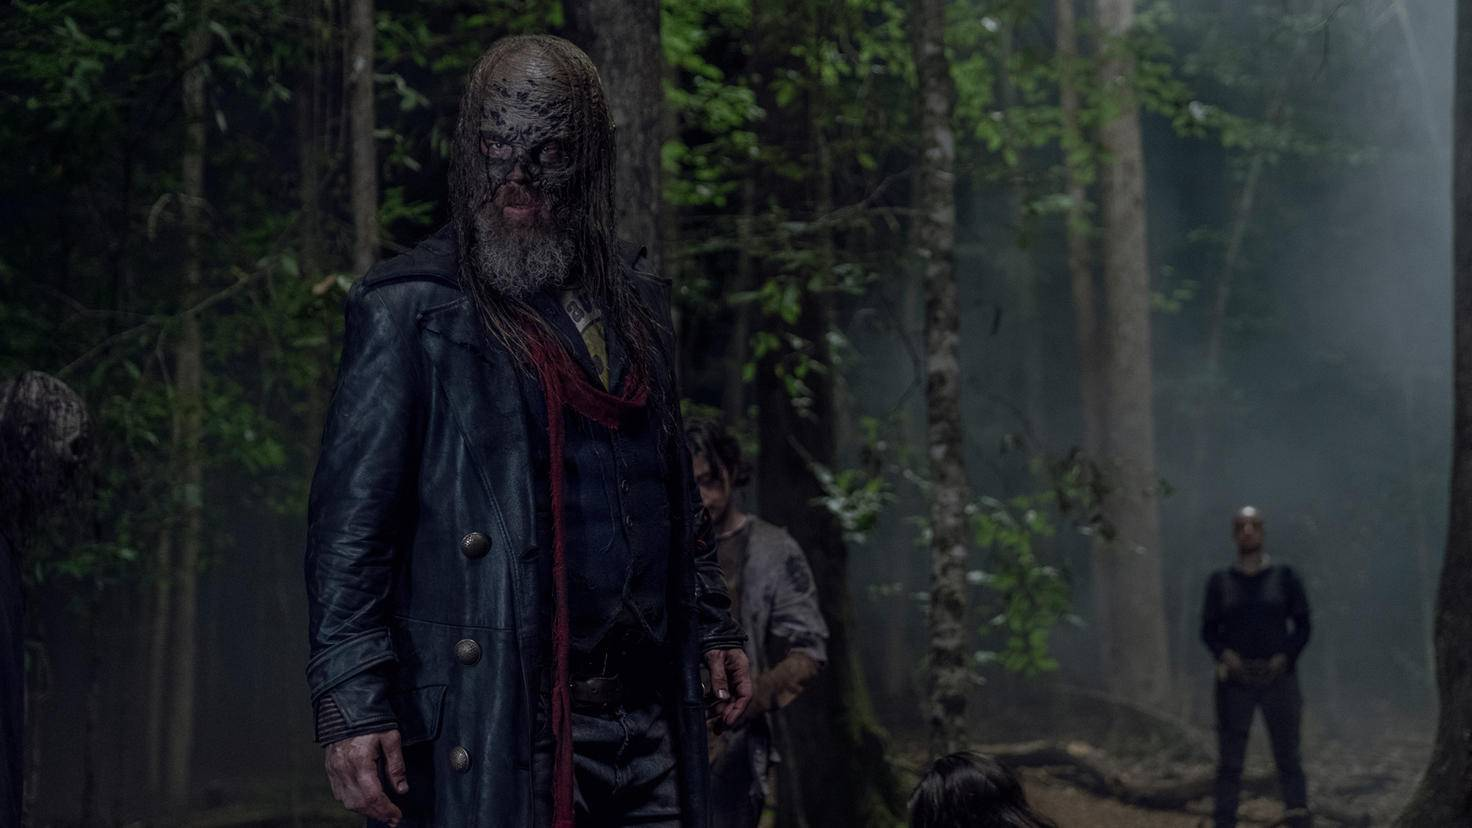 The Walking Dead-S10E06-Beta-Alpha-Jace Downs-AMC